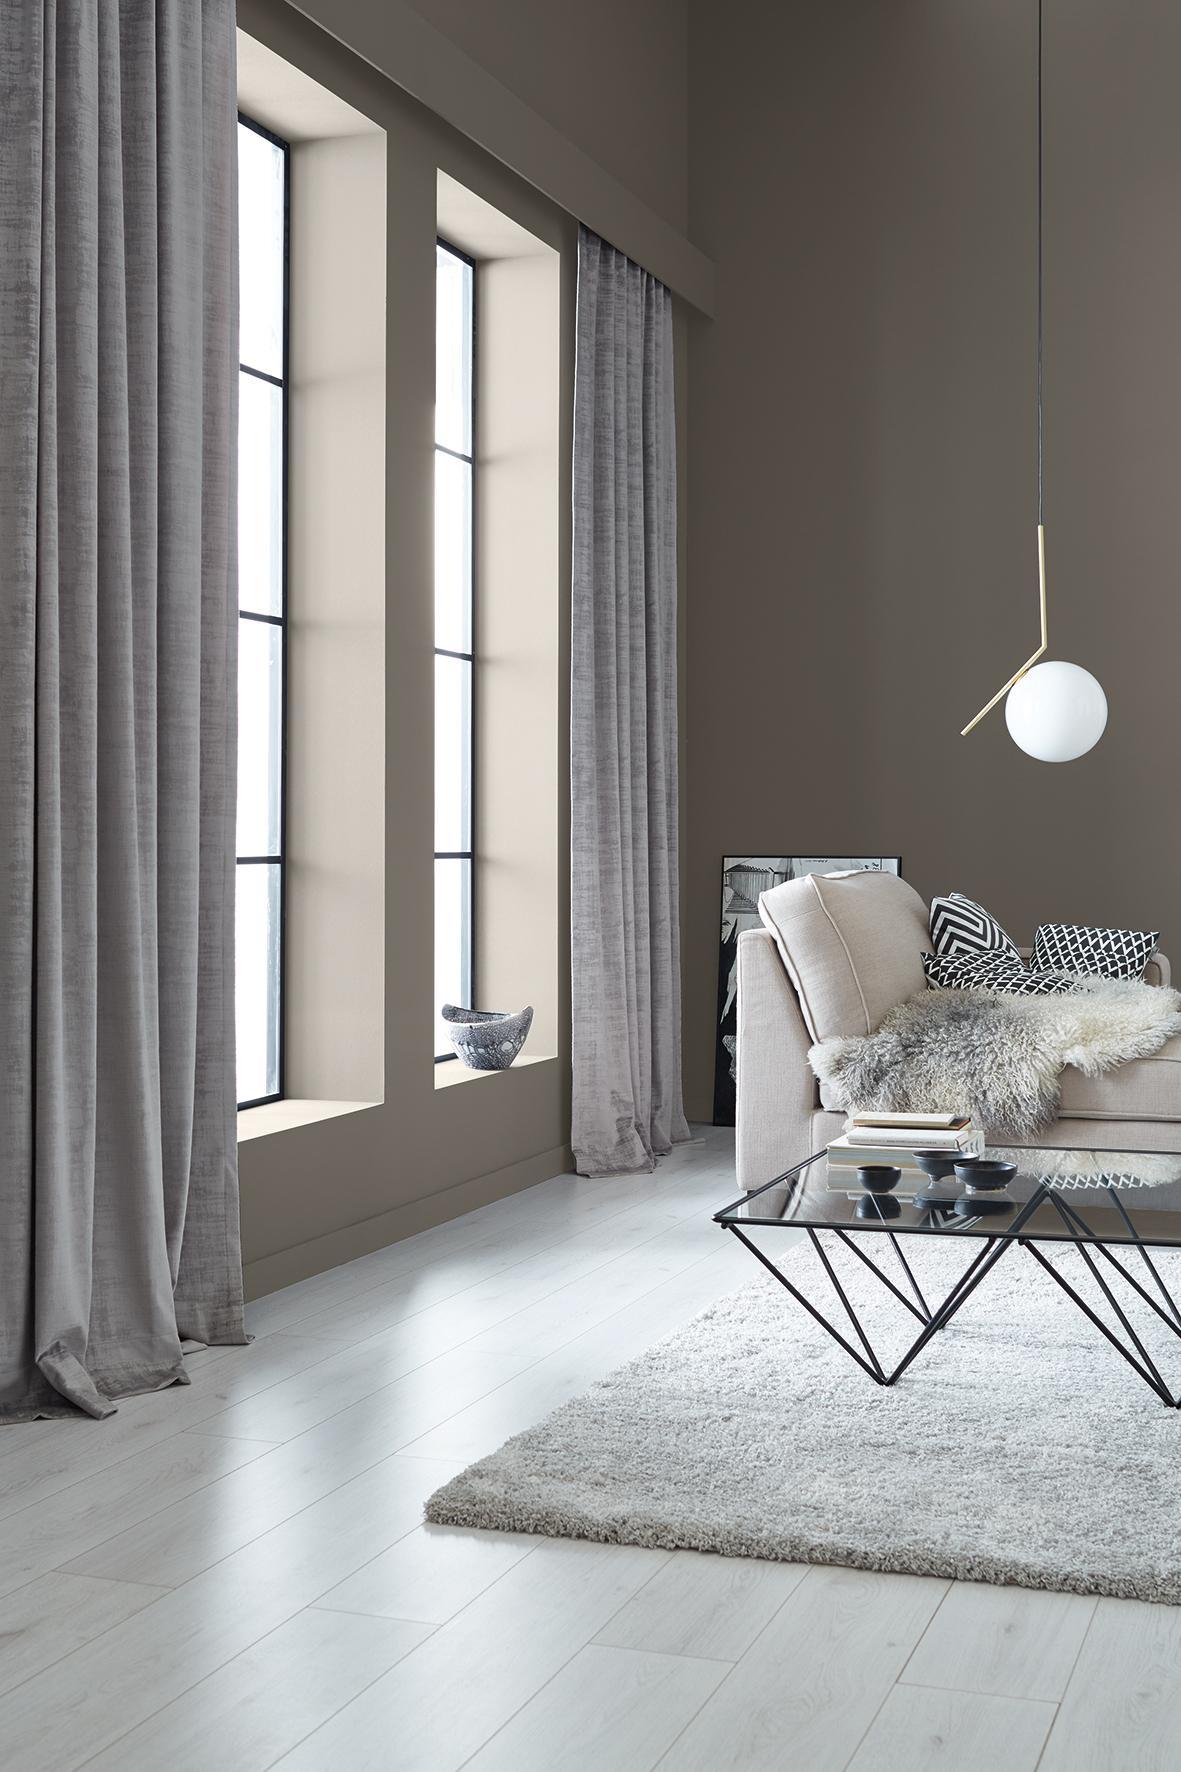 graue wandfarbe bilder ideen couchstyle. Black Bedroom Furniture Sets. Home Design Ideas